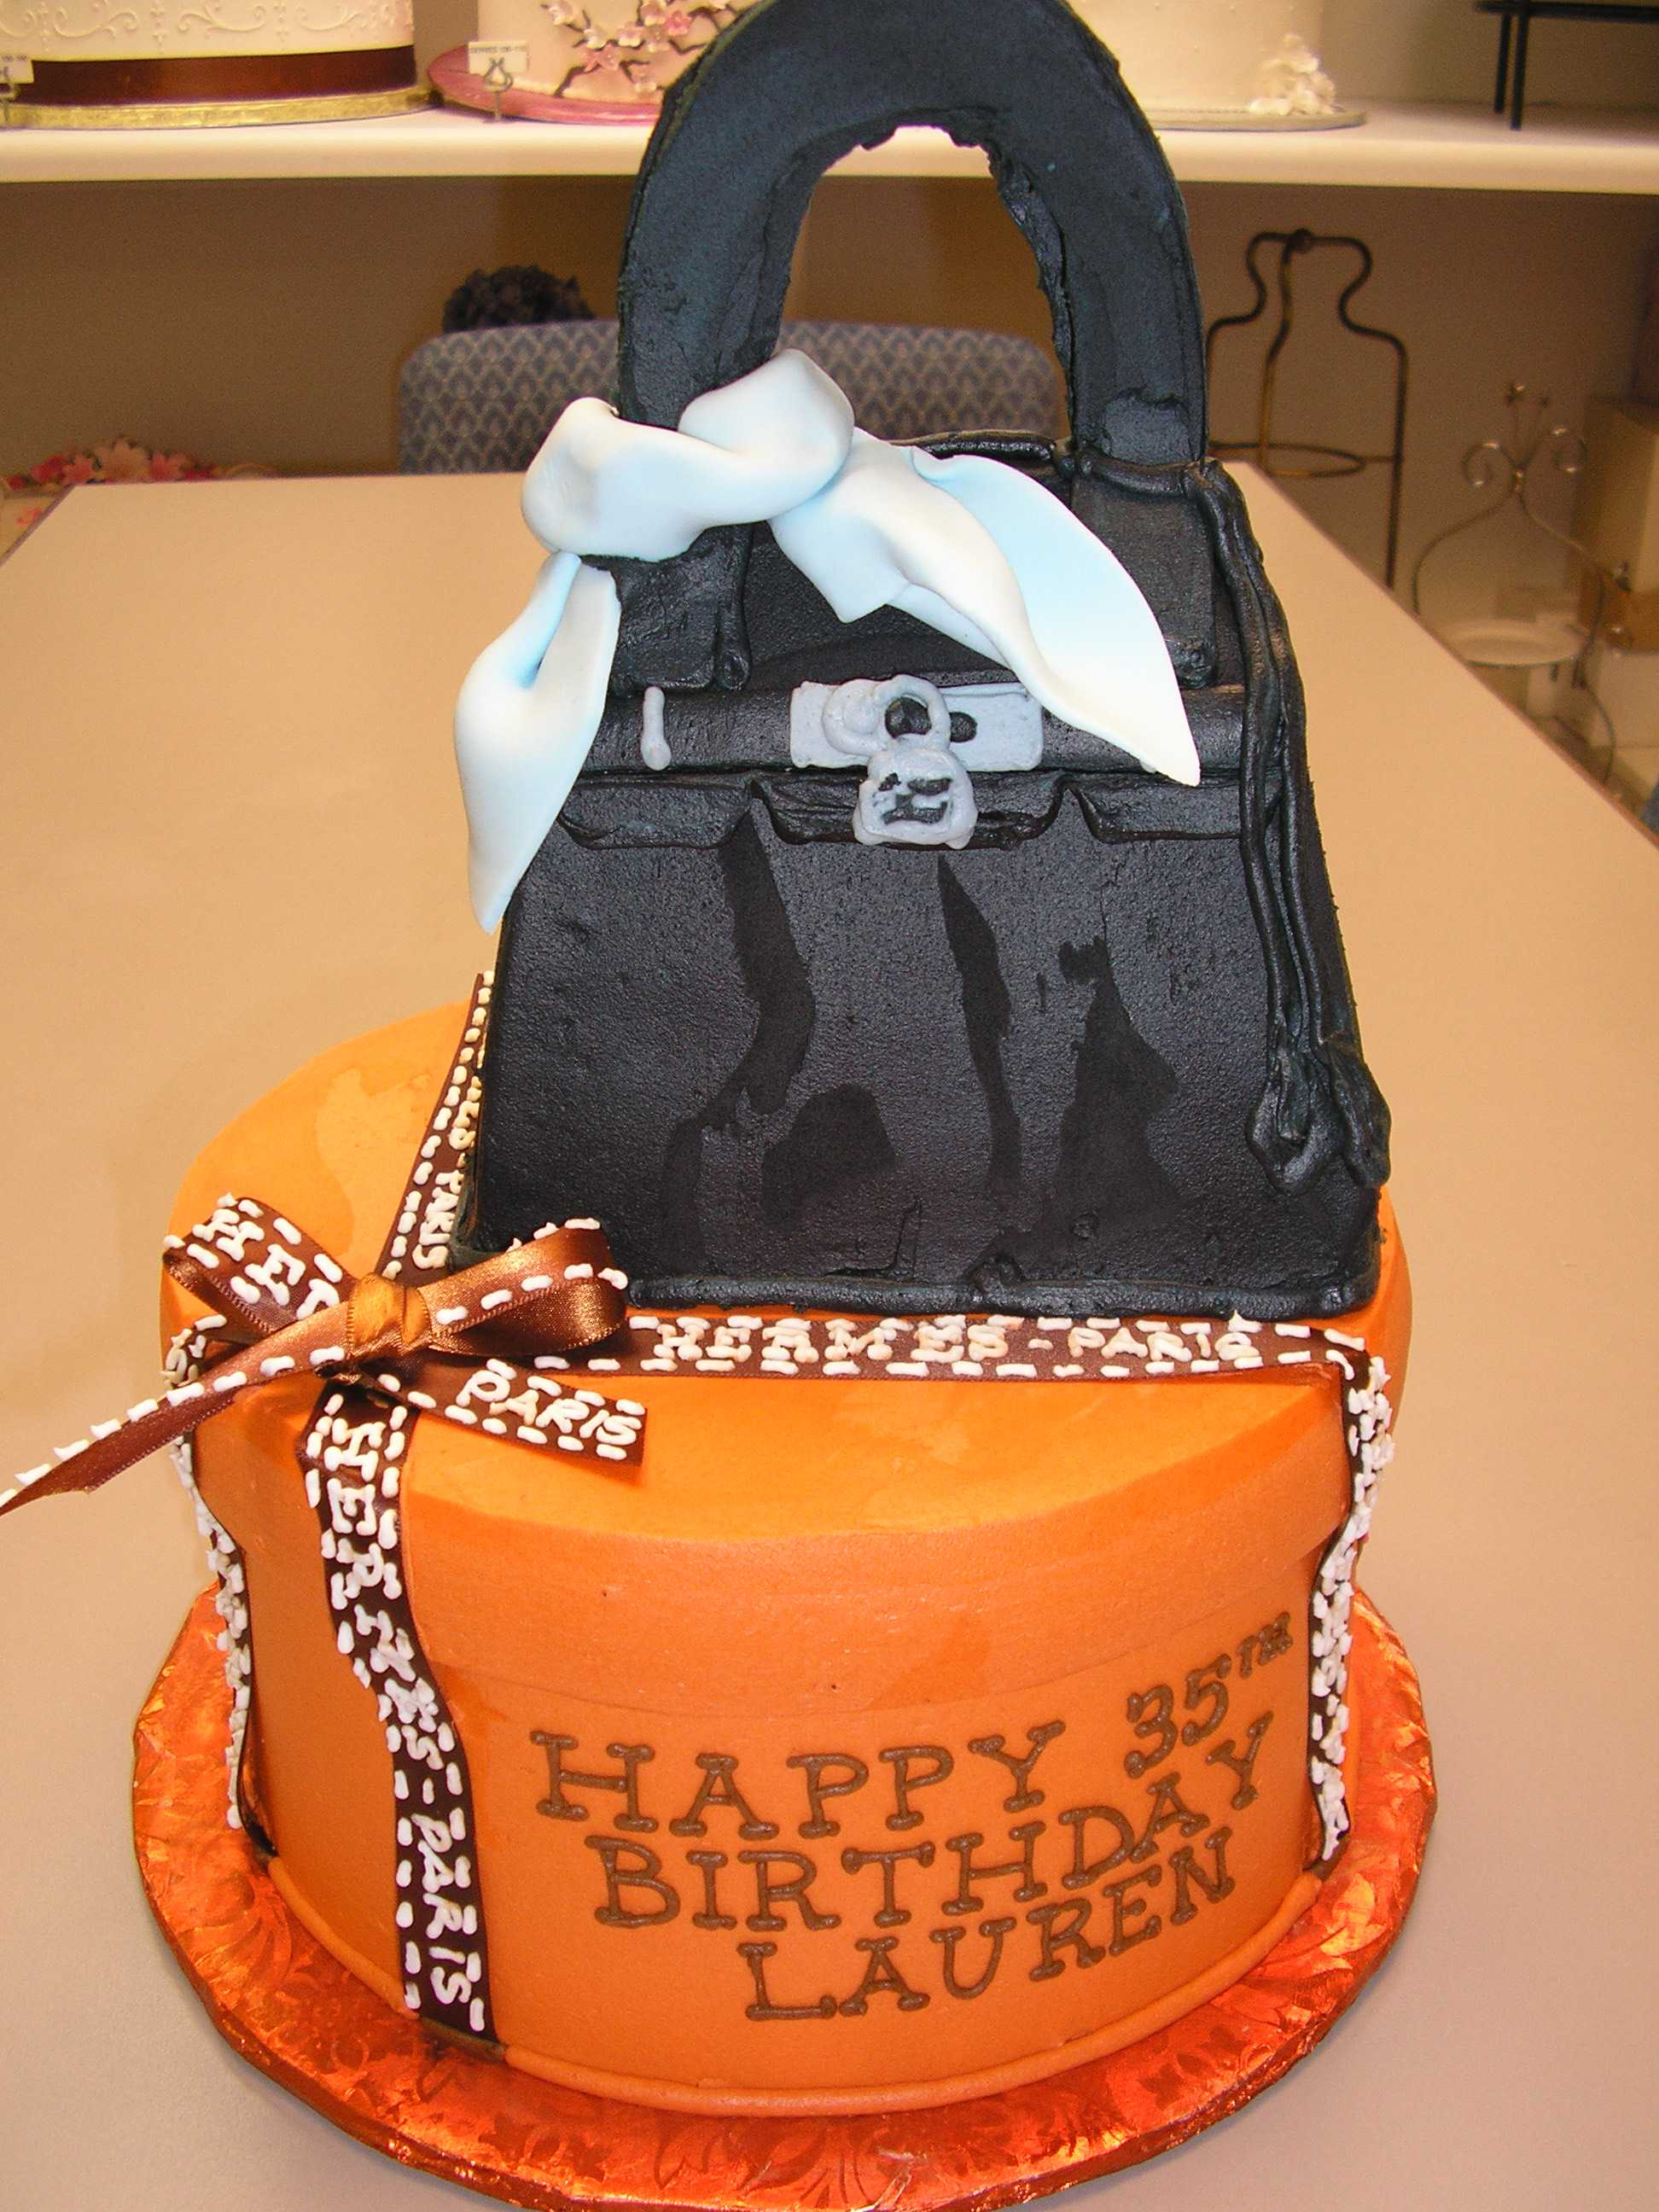 hermes cake, handbag cake